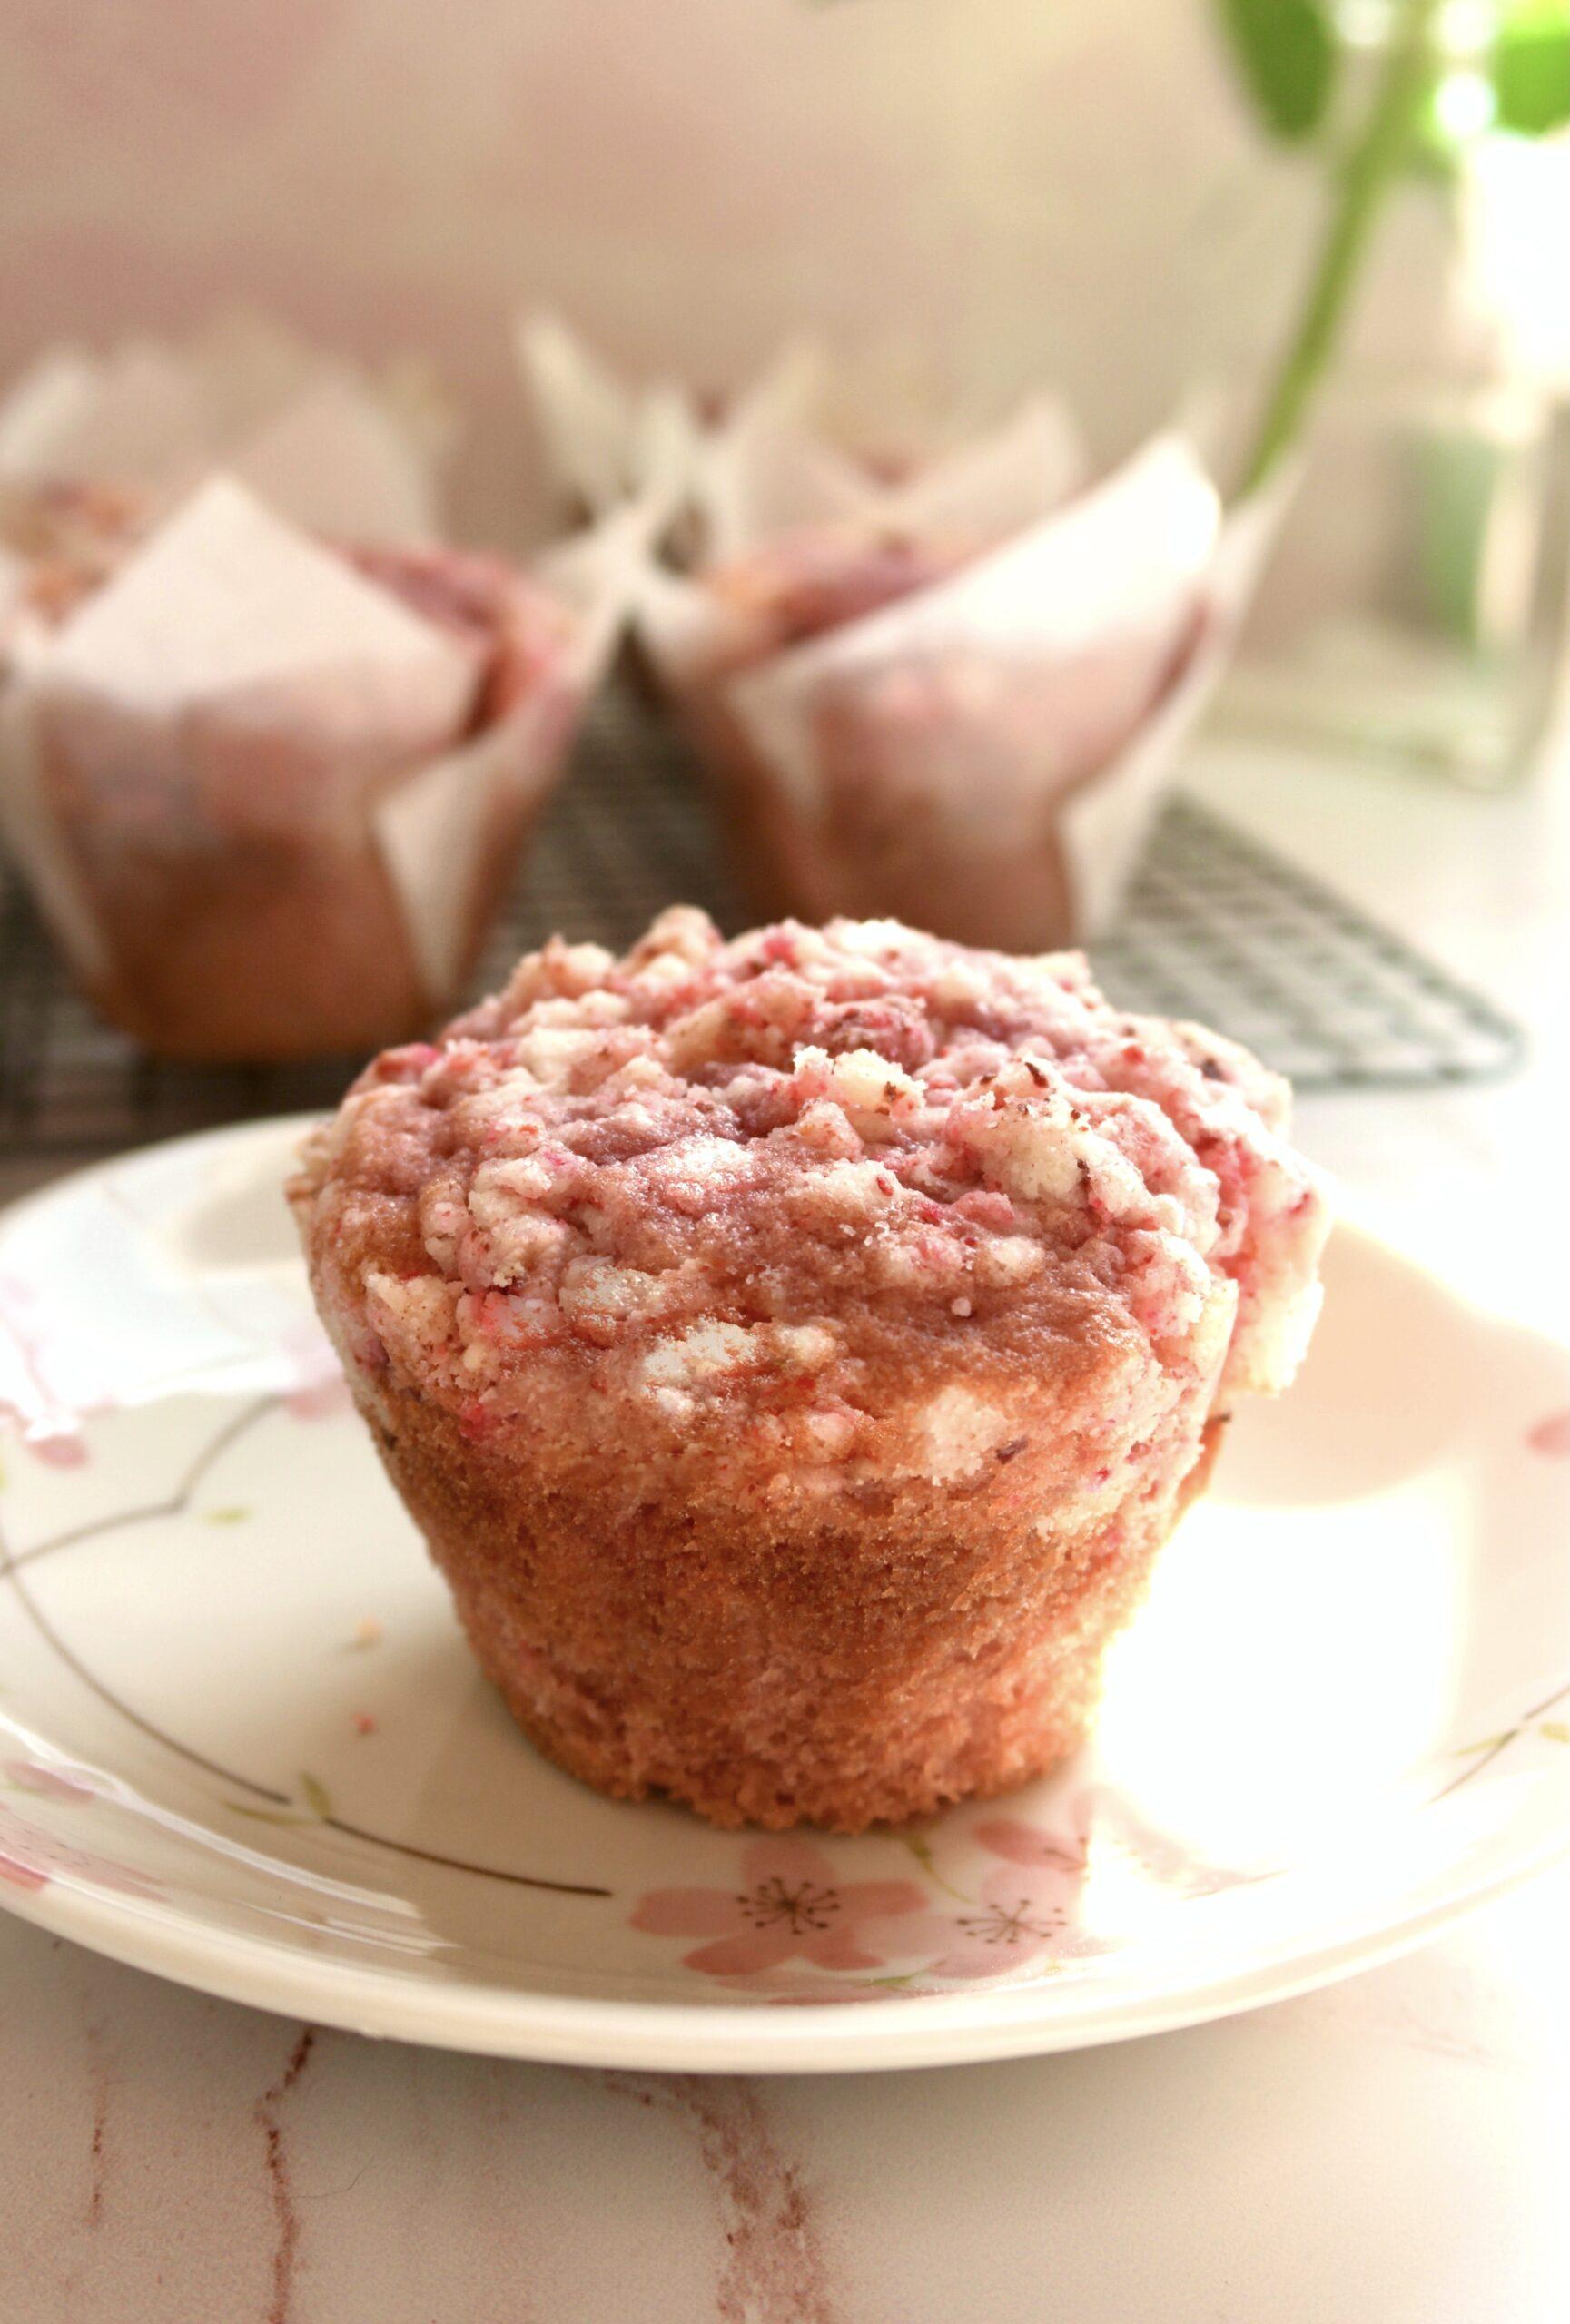 strawberrry shortcake crumble muffins